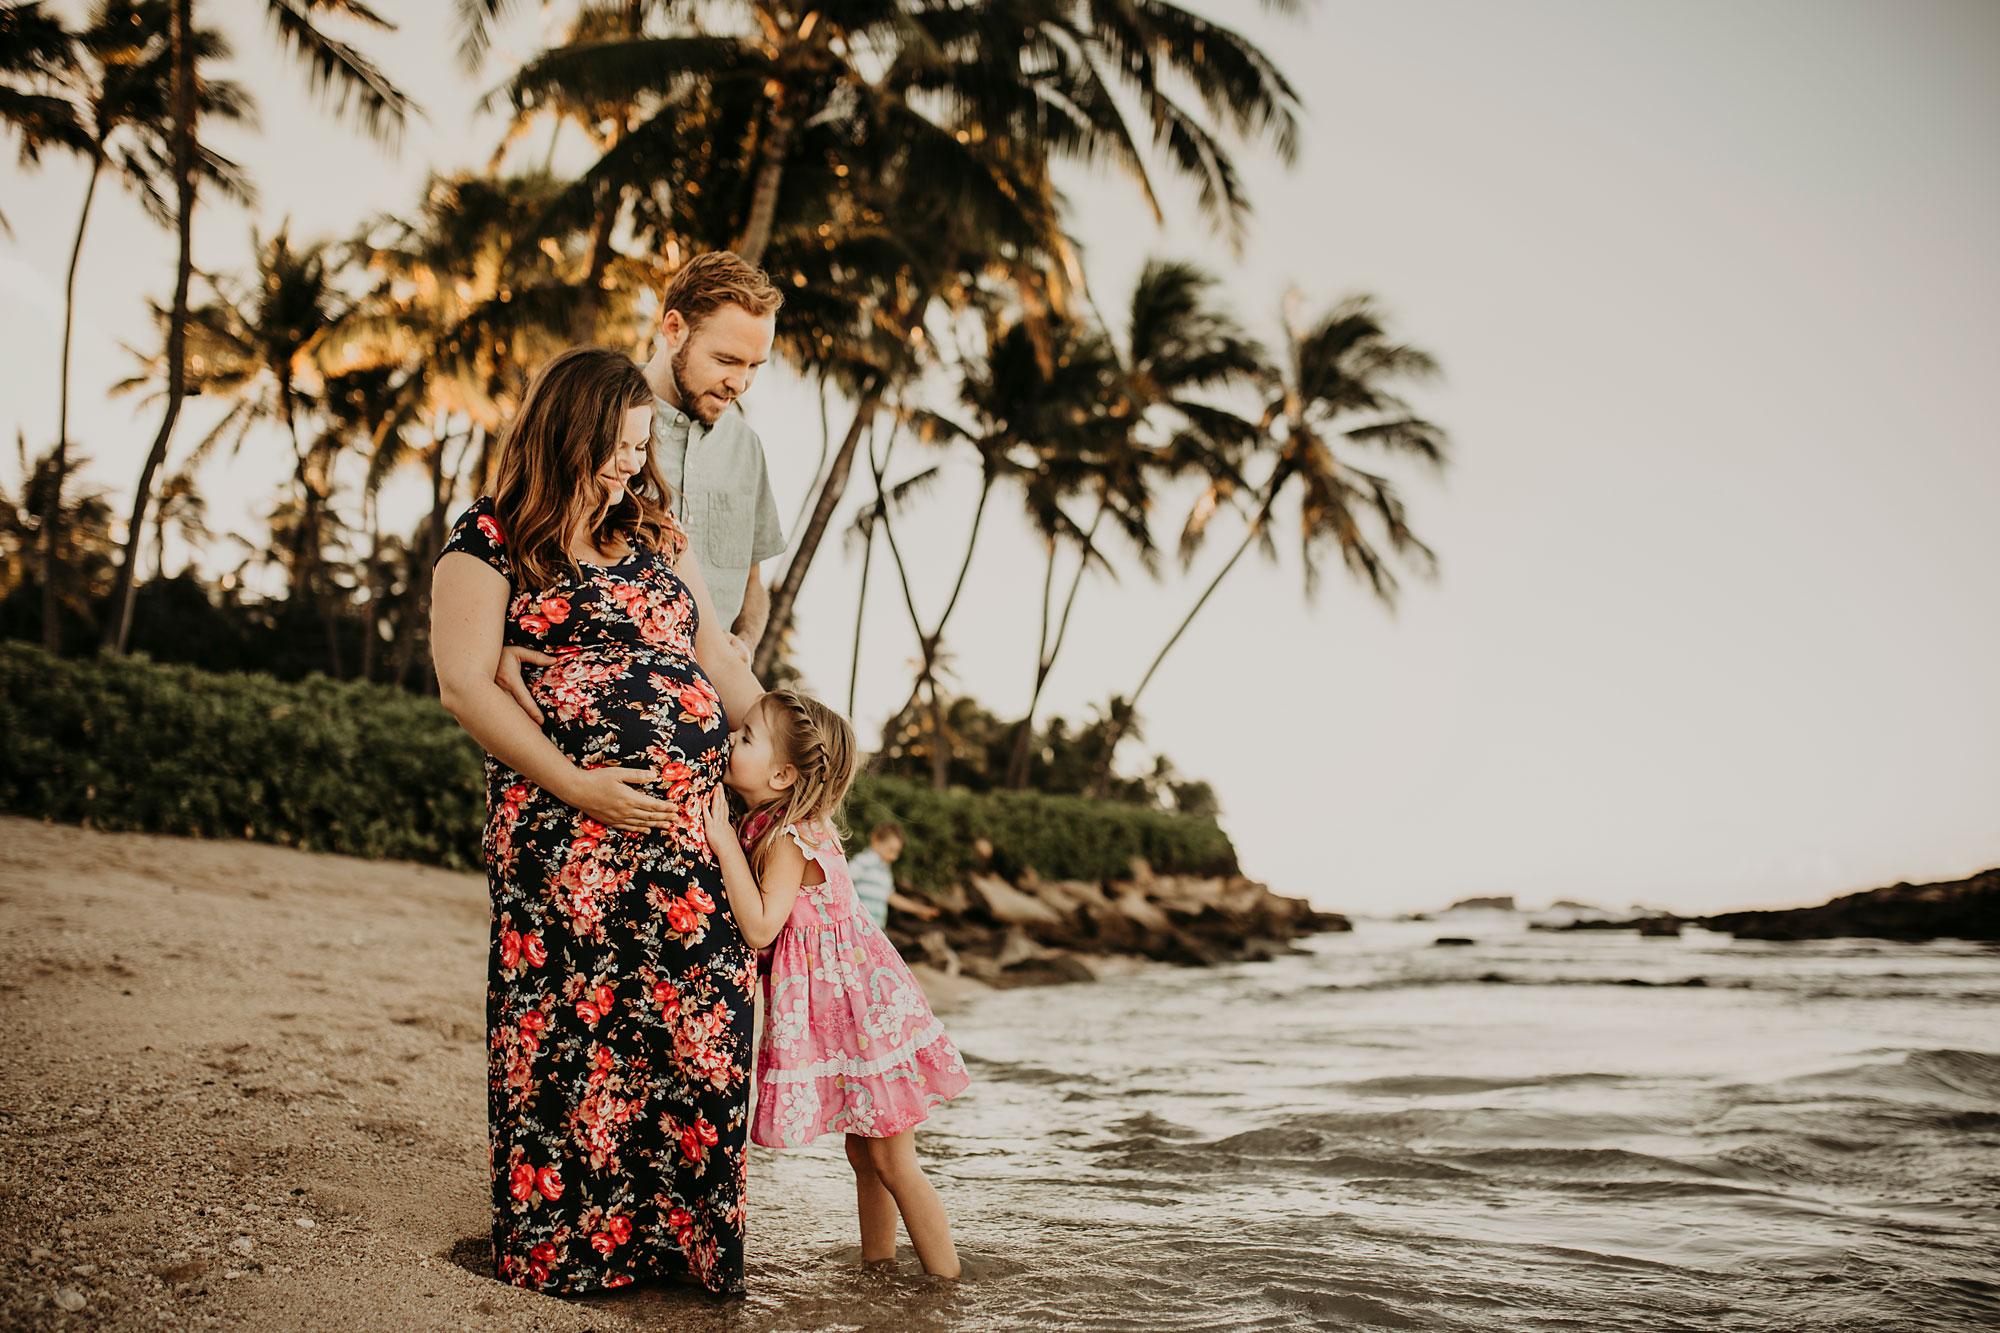 oahu-maternity-photographer-9.jpg